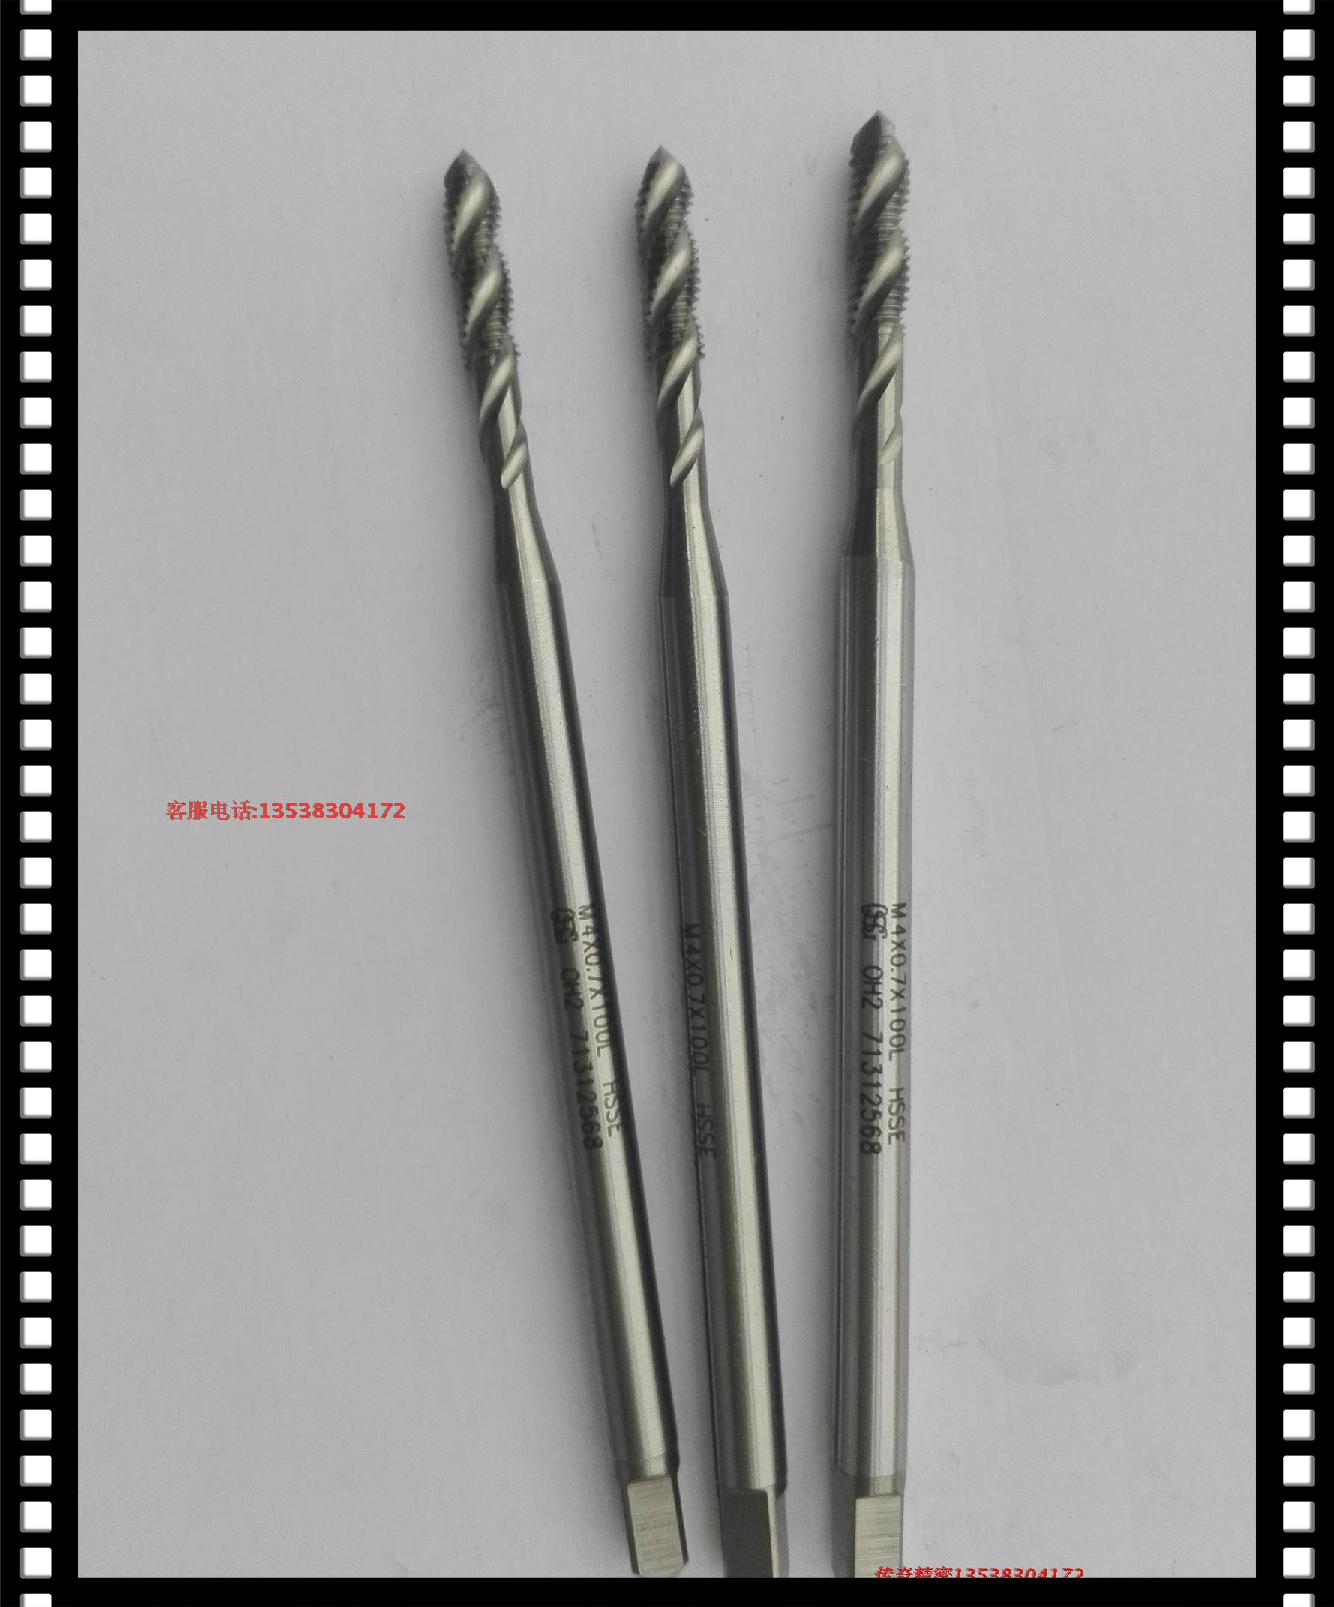 Japan OSG 100MM Long Spiral Tap M4X0.7M12X1.751/4-205/16-183/8-16